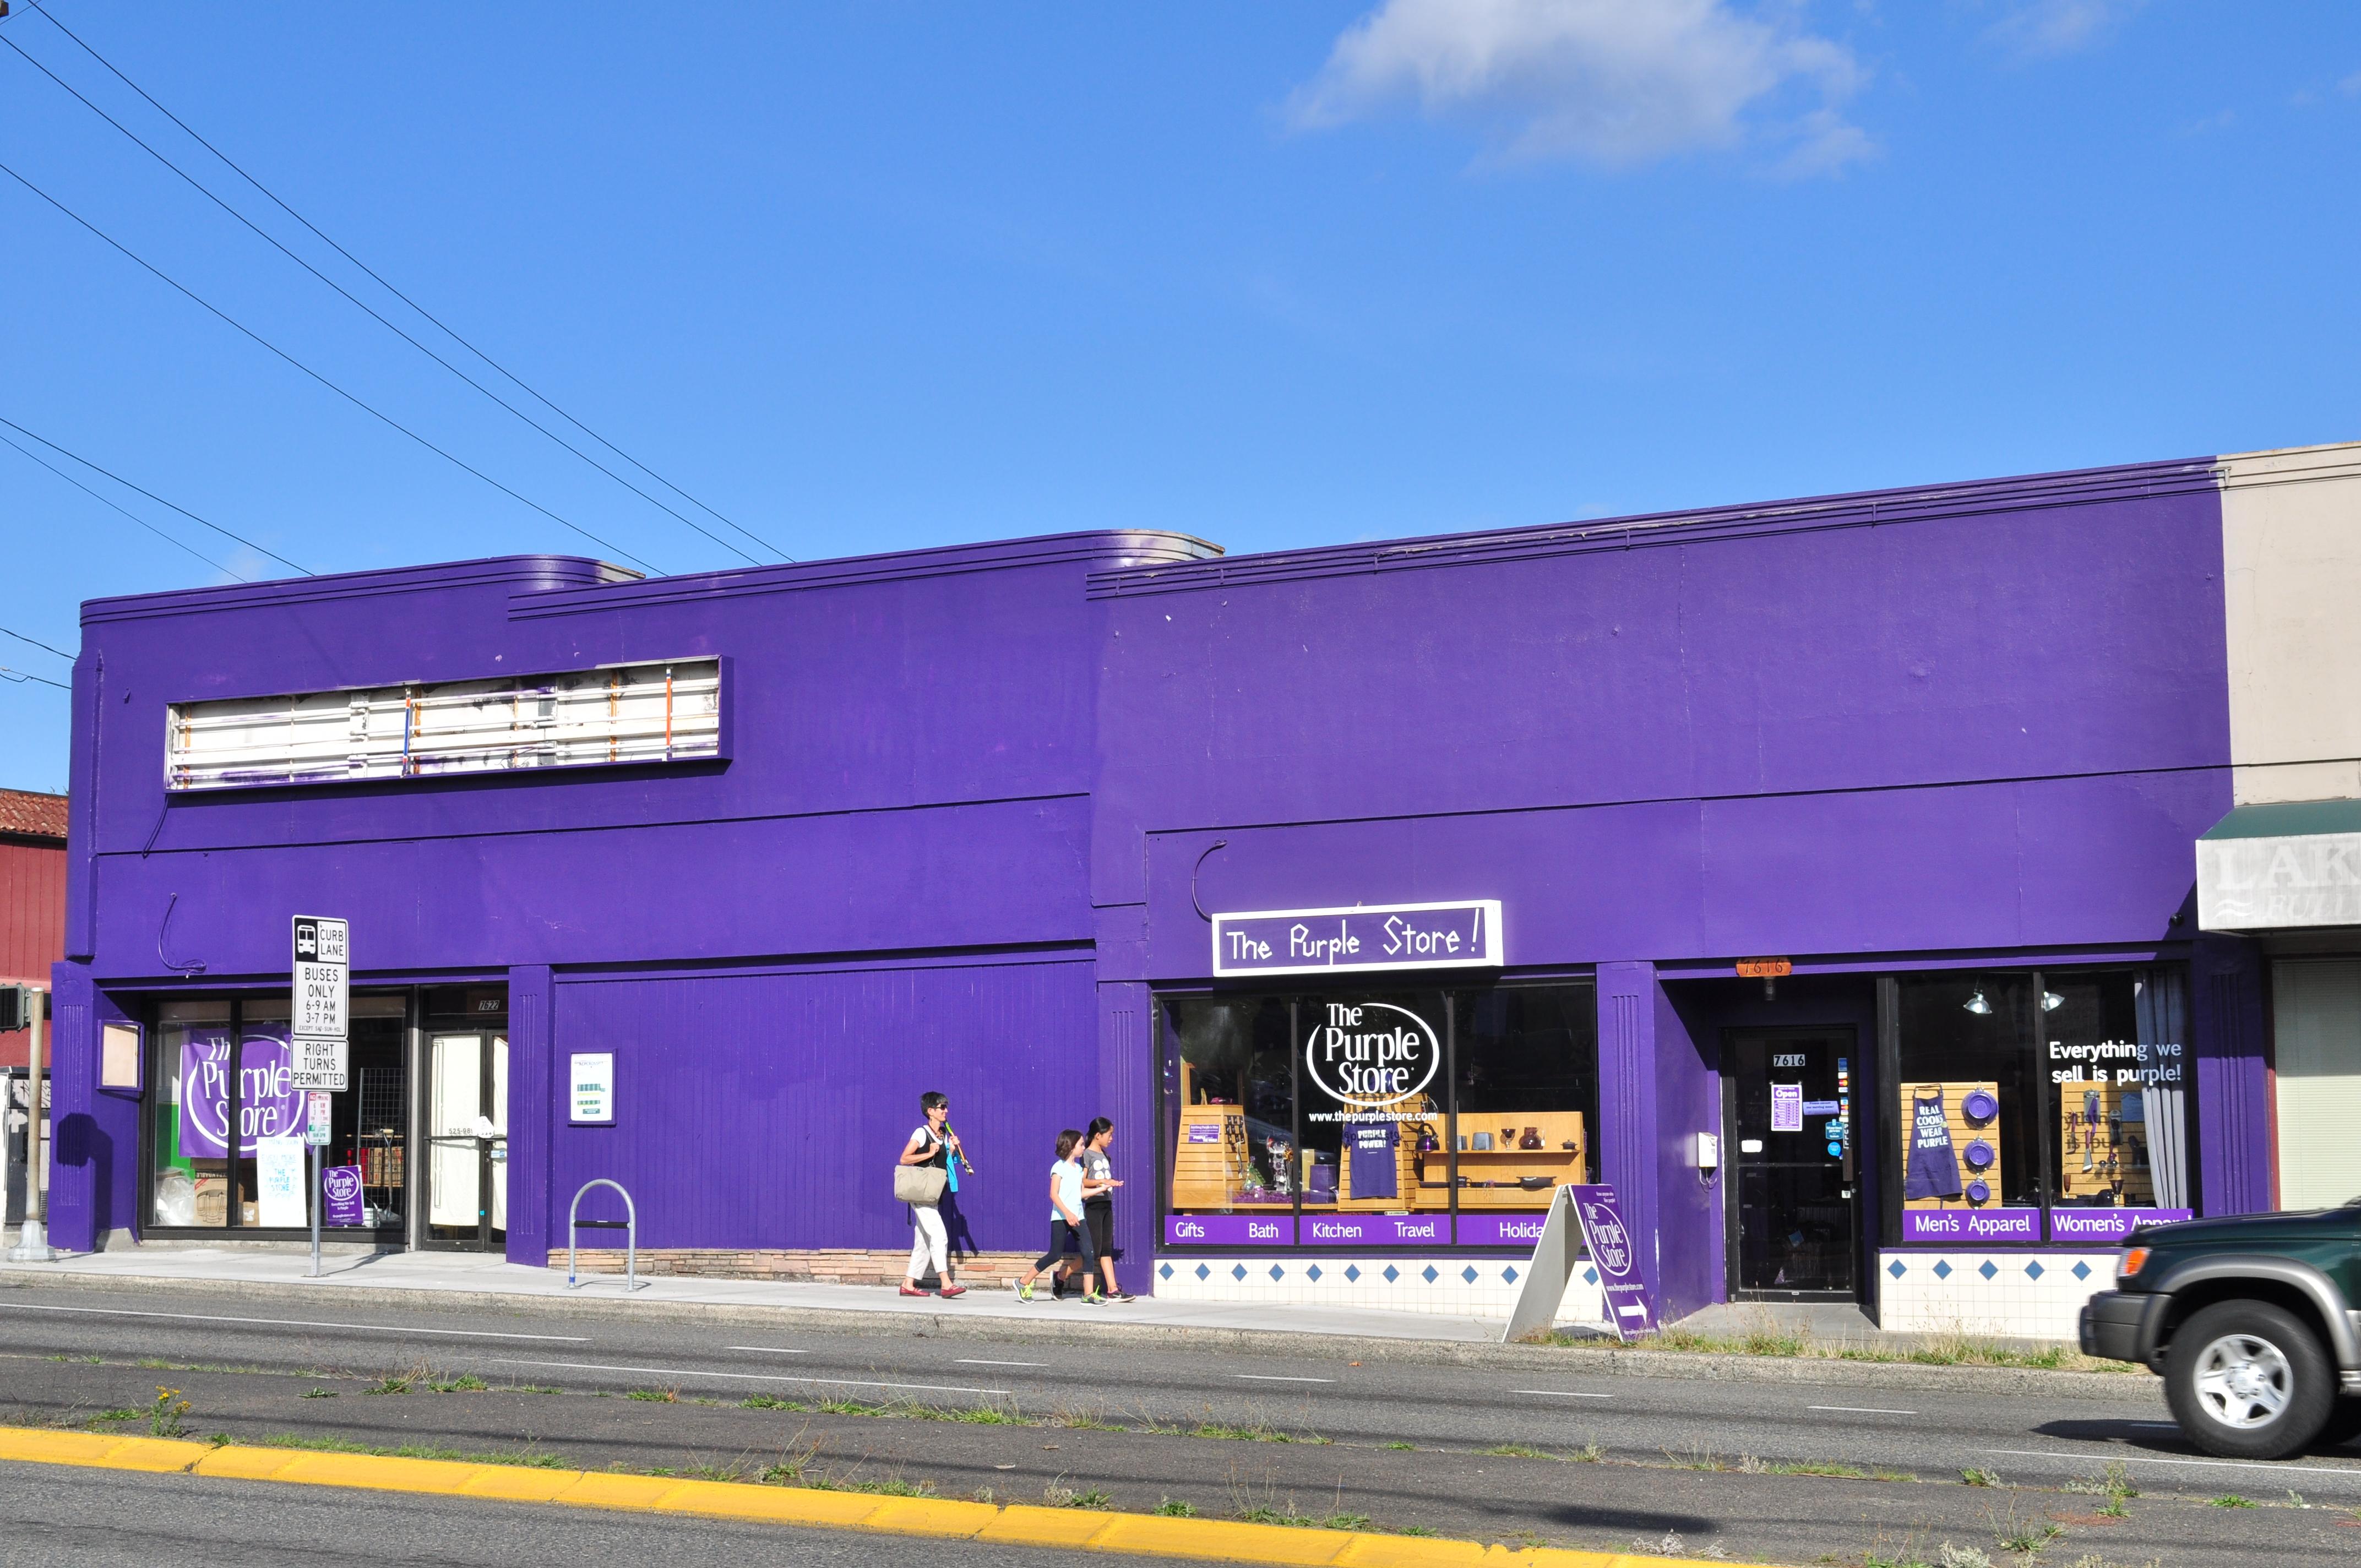 File:Seattle - The Purple Store 01.jpg - Wikimedia Commons